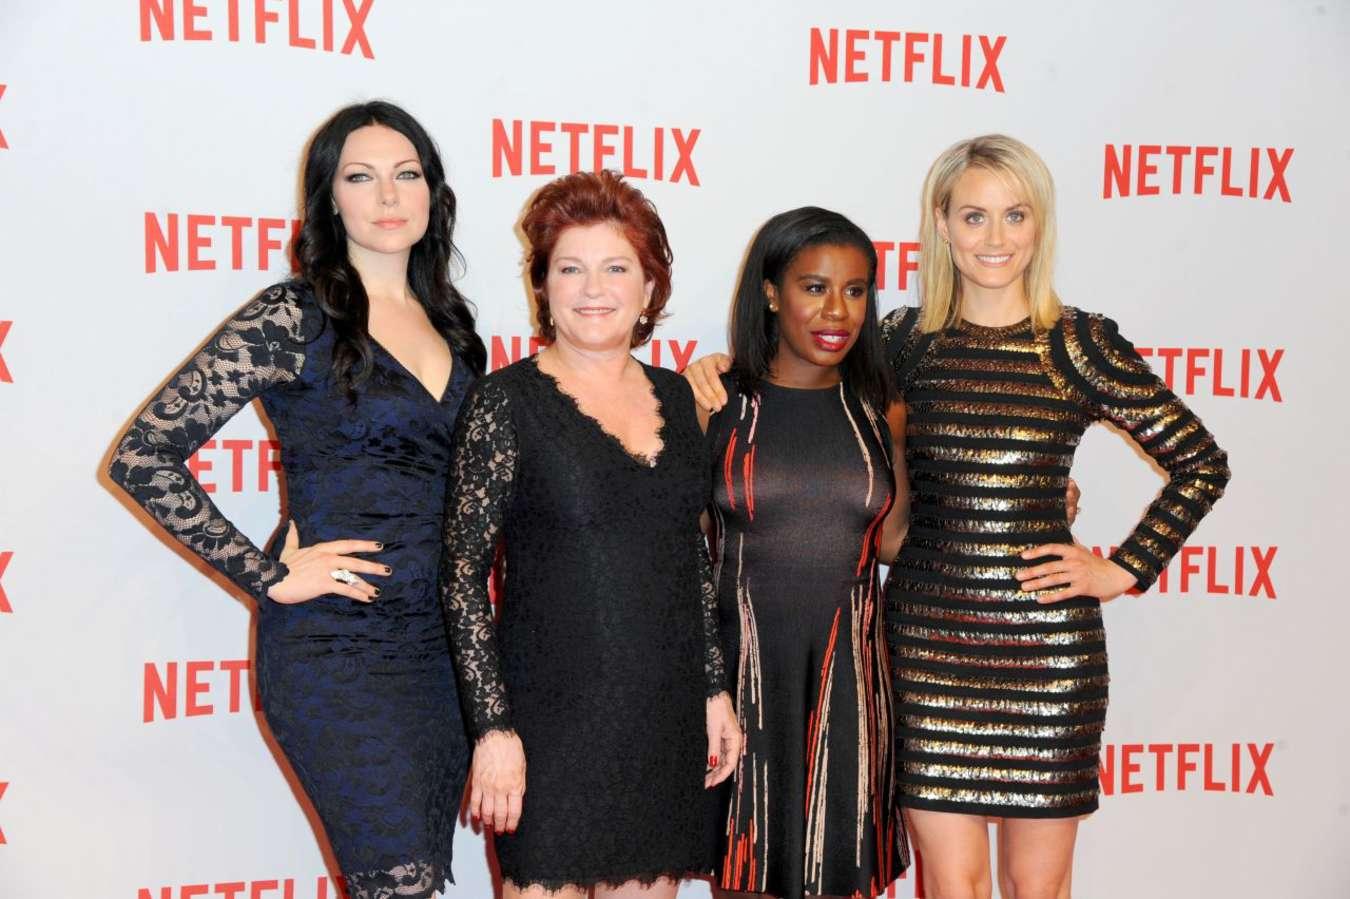 Kate Mulgrew Netflix Launch Party in Berlin